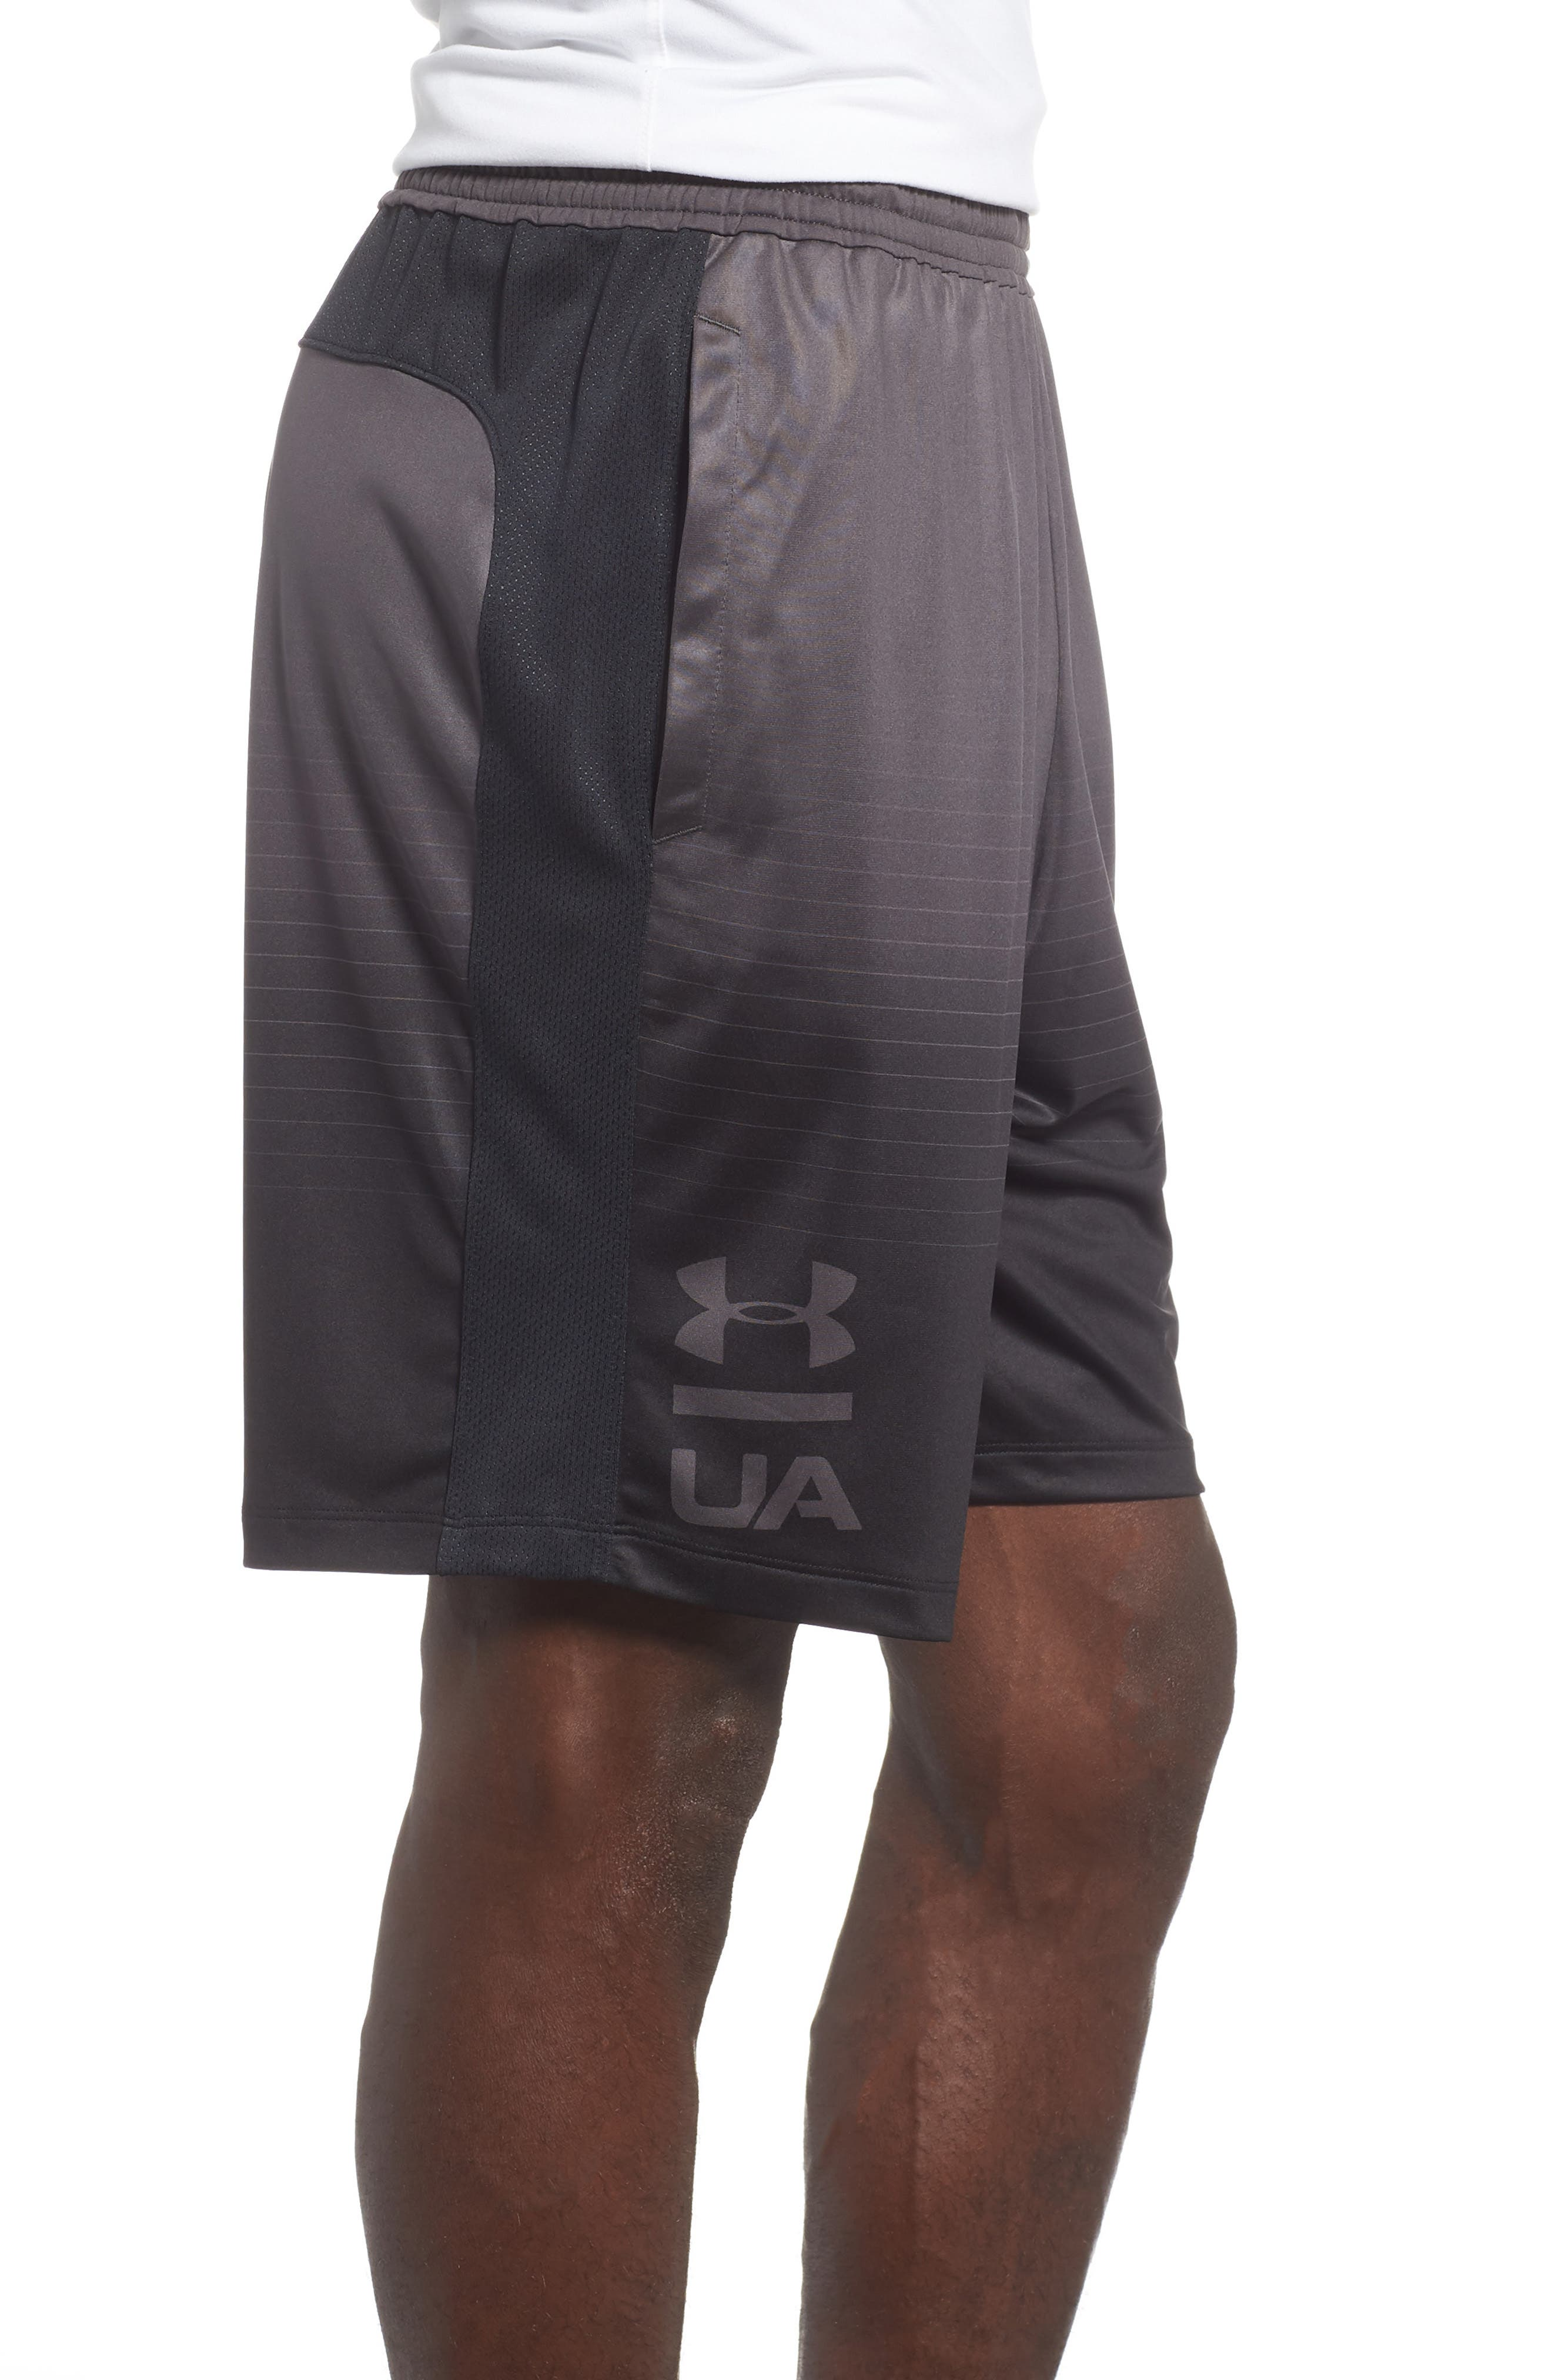 MK-1 Fade Shorts,                             Alternate thumbnail 3, color,                             CHARCOAL